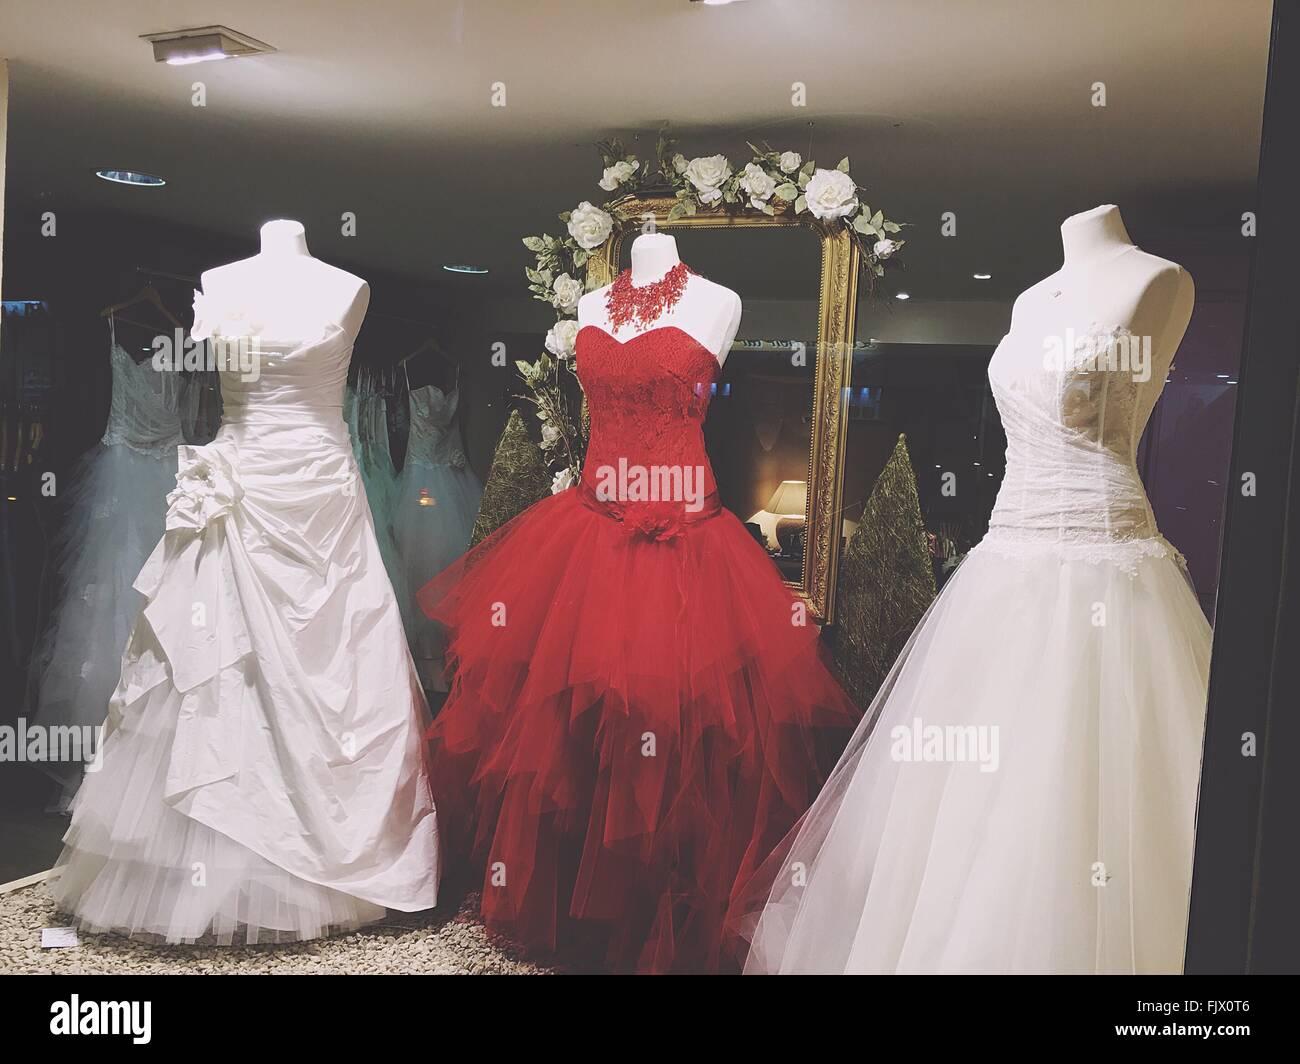 Wedding Dresses Shop Display Stock Photos & Wedding Dresses Shop ...